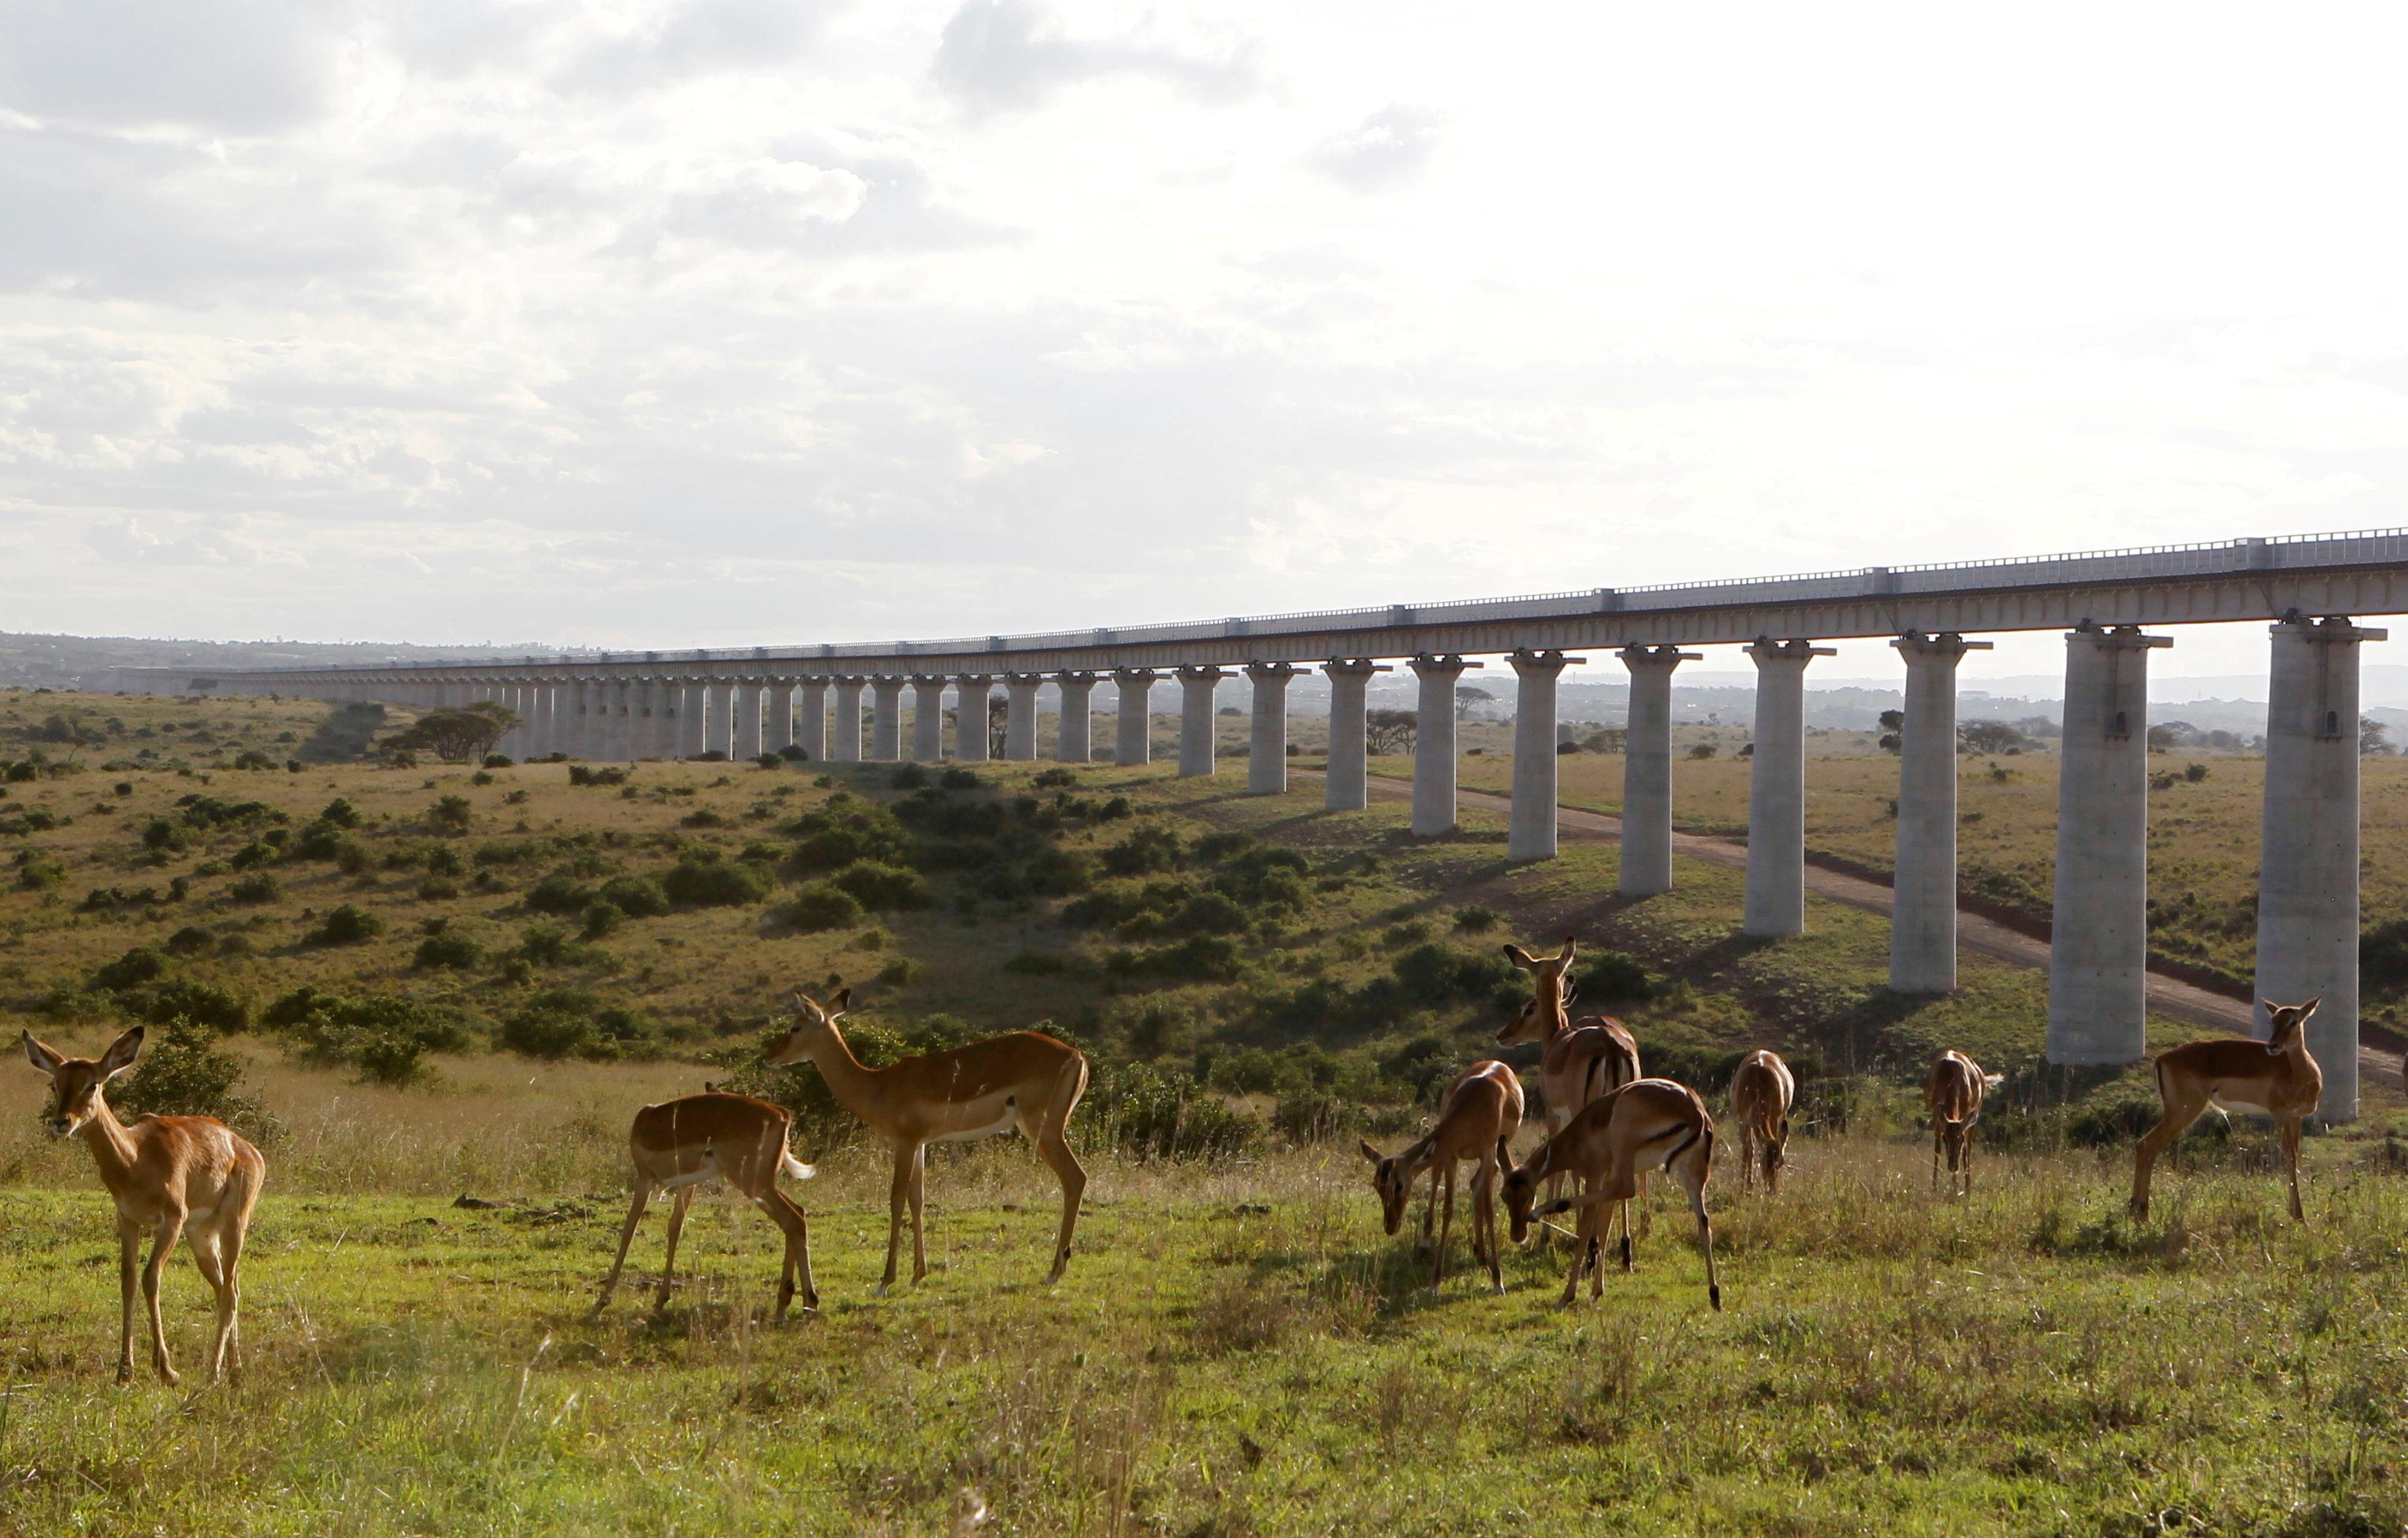 A group of impala graze near the elevated railway line that allows movement of animals below the Standard Gauge Railway (SGR) line linking Nairobi and Naivasha inside the Nairobi national park in Nairobi, Kenya October 16, 2019. REUTERS/Njeri Mwangi/File Photo